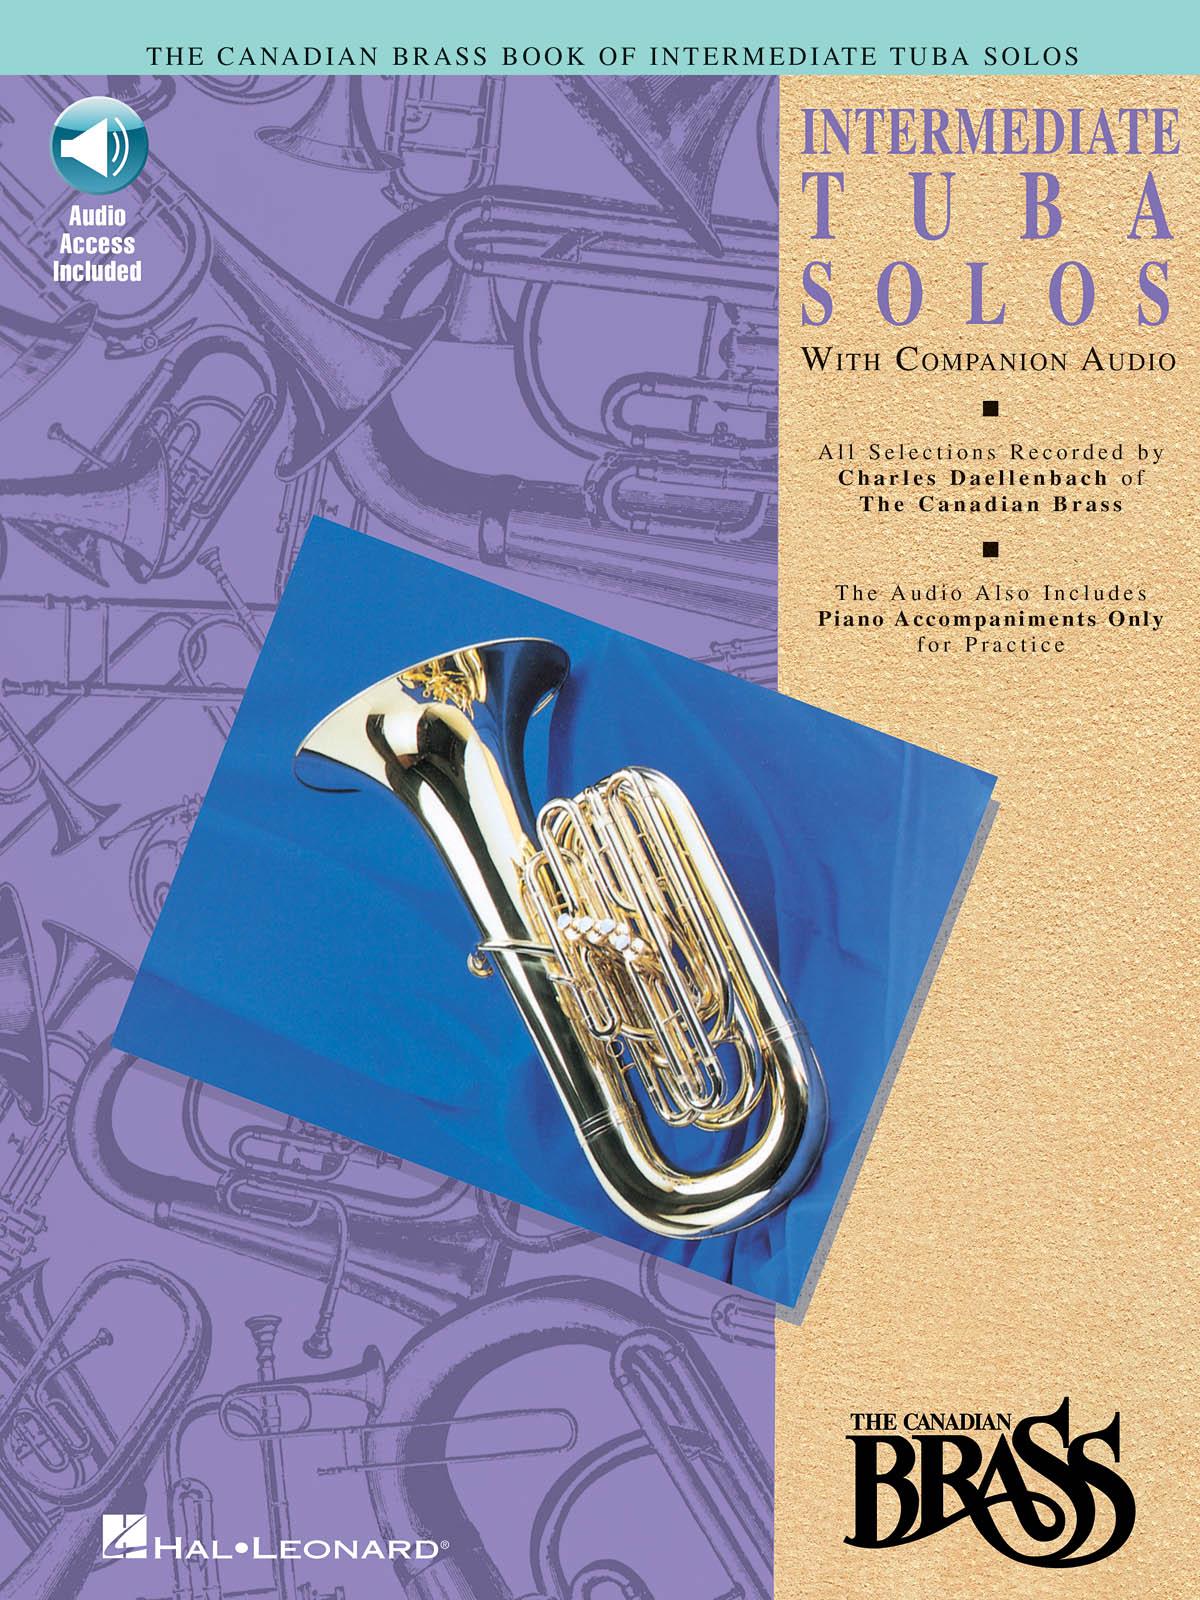 The Canadian Brass: Canadian Brass Book Of Intermediate Tuba Solos: Tuba Solo: